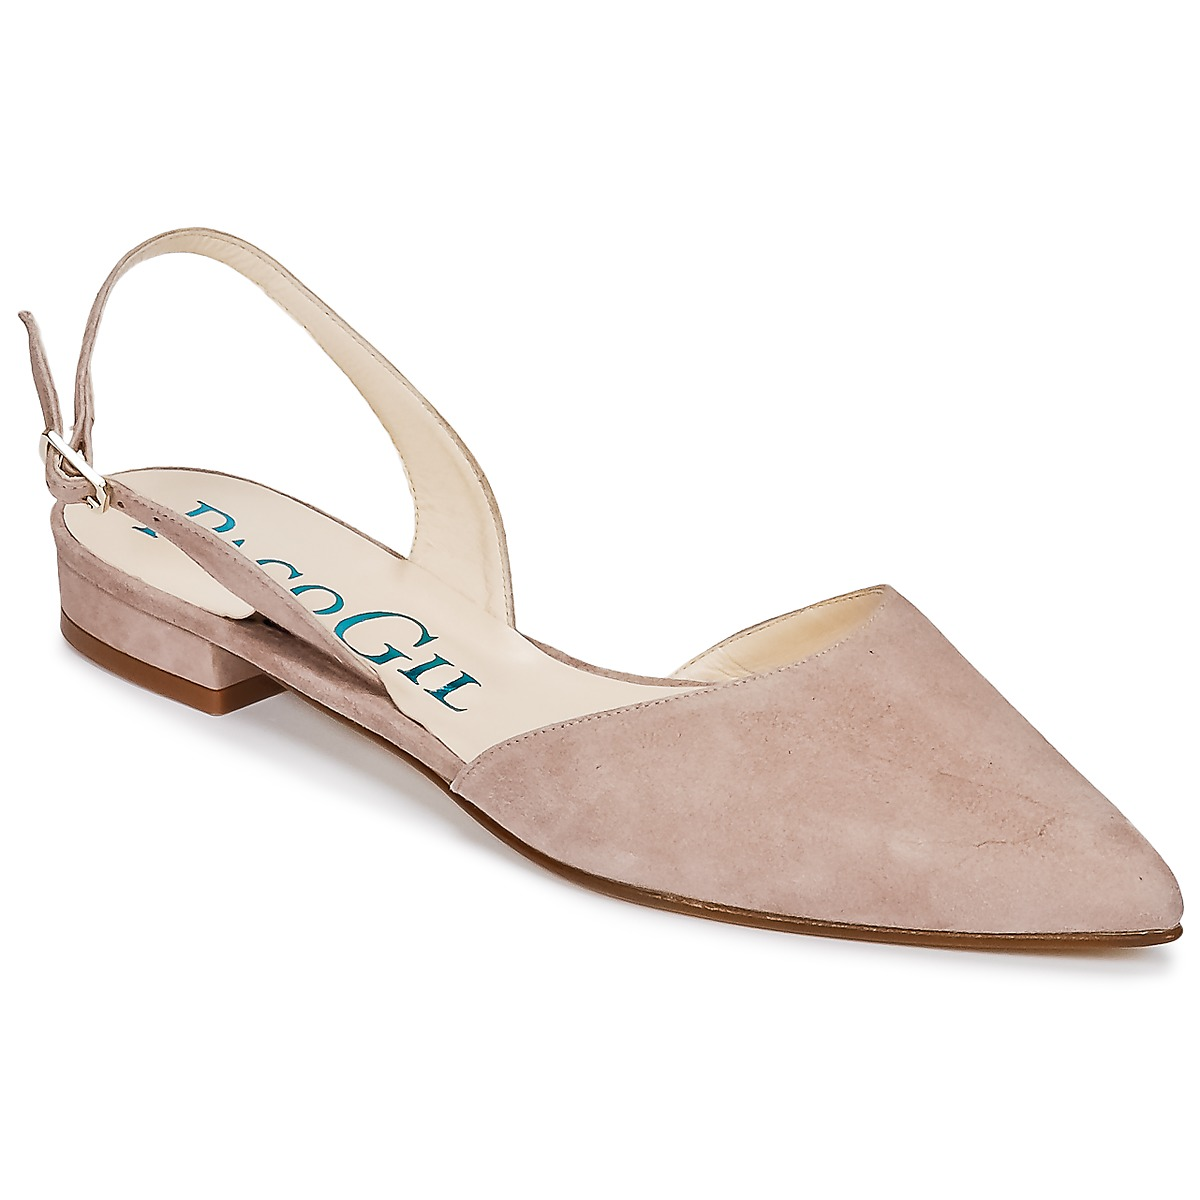 Paco Gil MARIE TOFLEX Rose - Kostenloser Versand bei Spartoode ! - Schuhe Sandalen / Sandaletten Damen 111,20 €